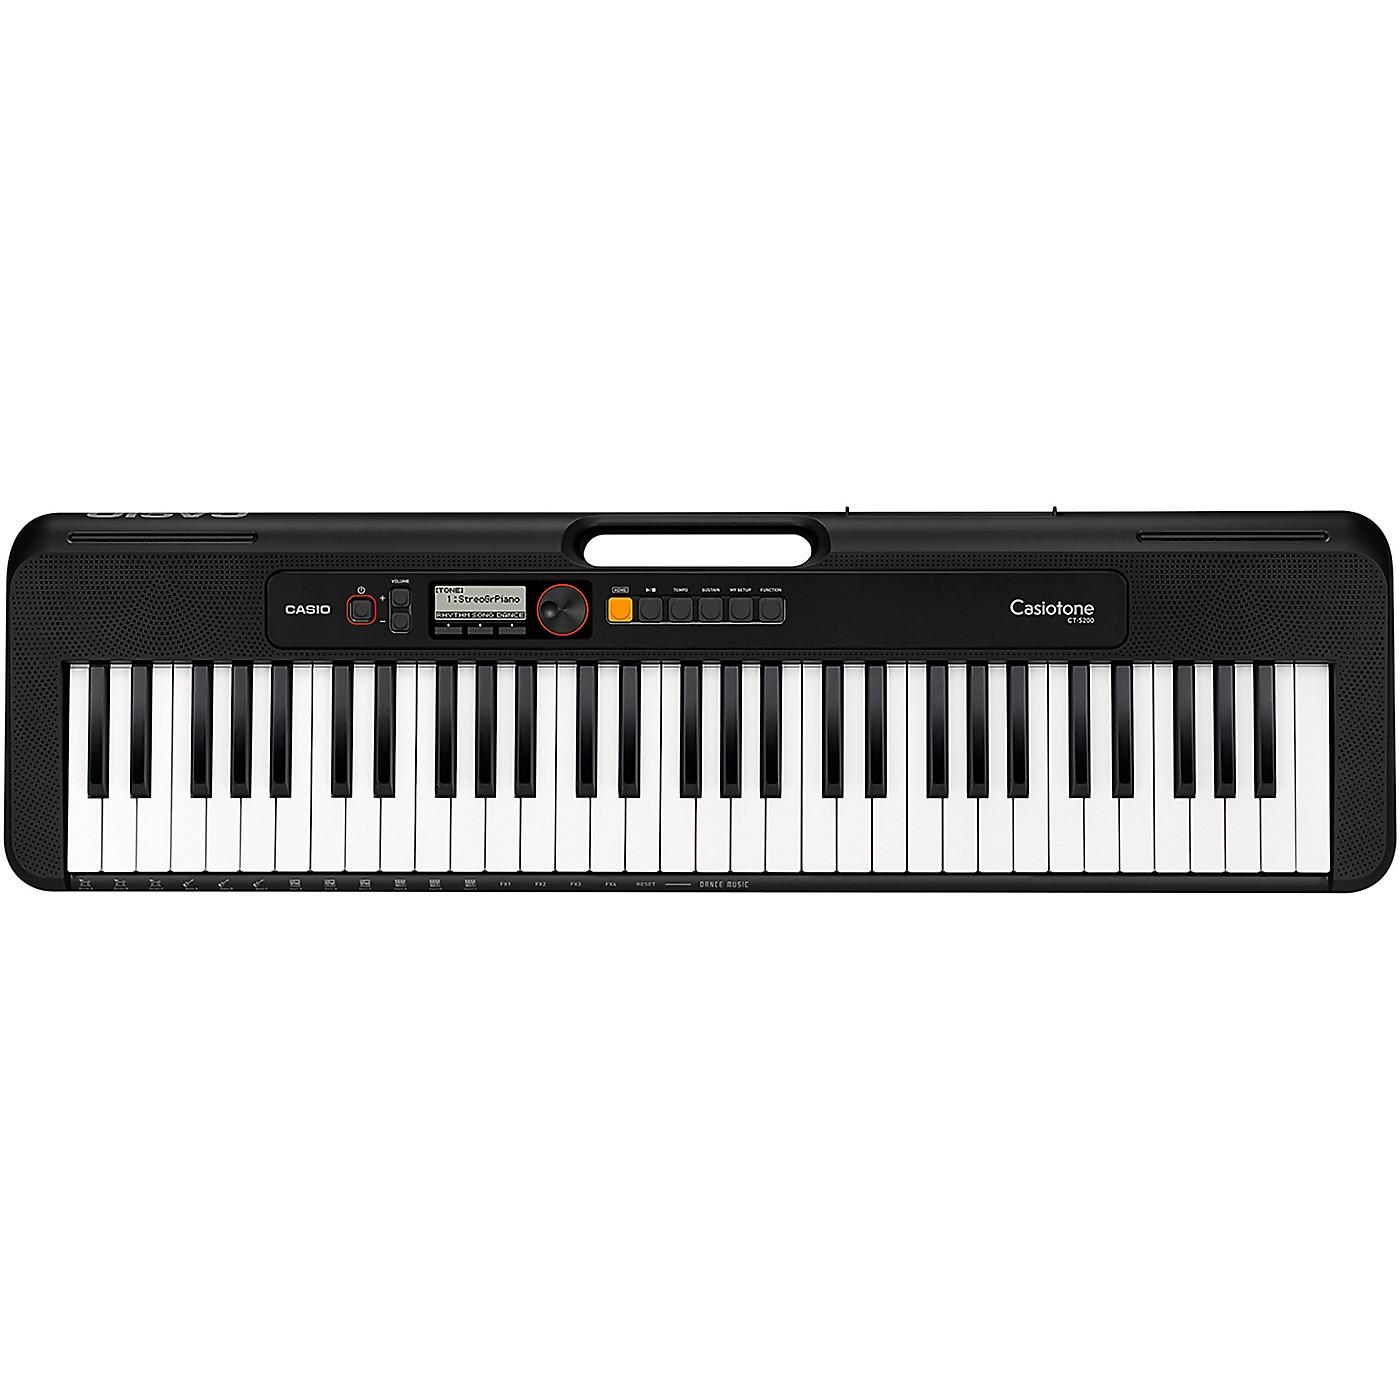 Casio Casiotone CT-S200 61-Key Digital Keyboard thumbnail